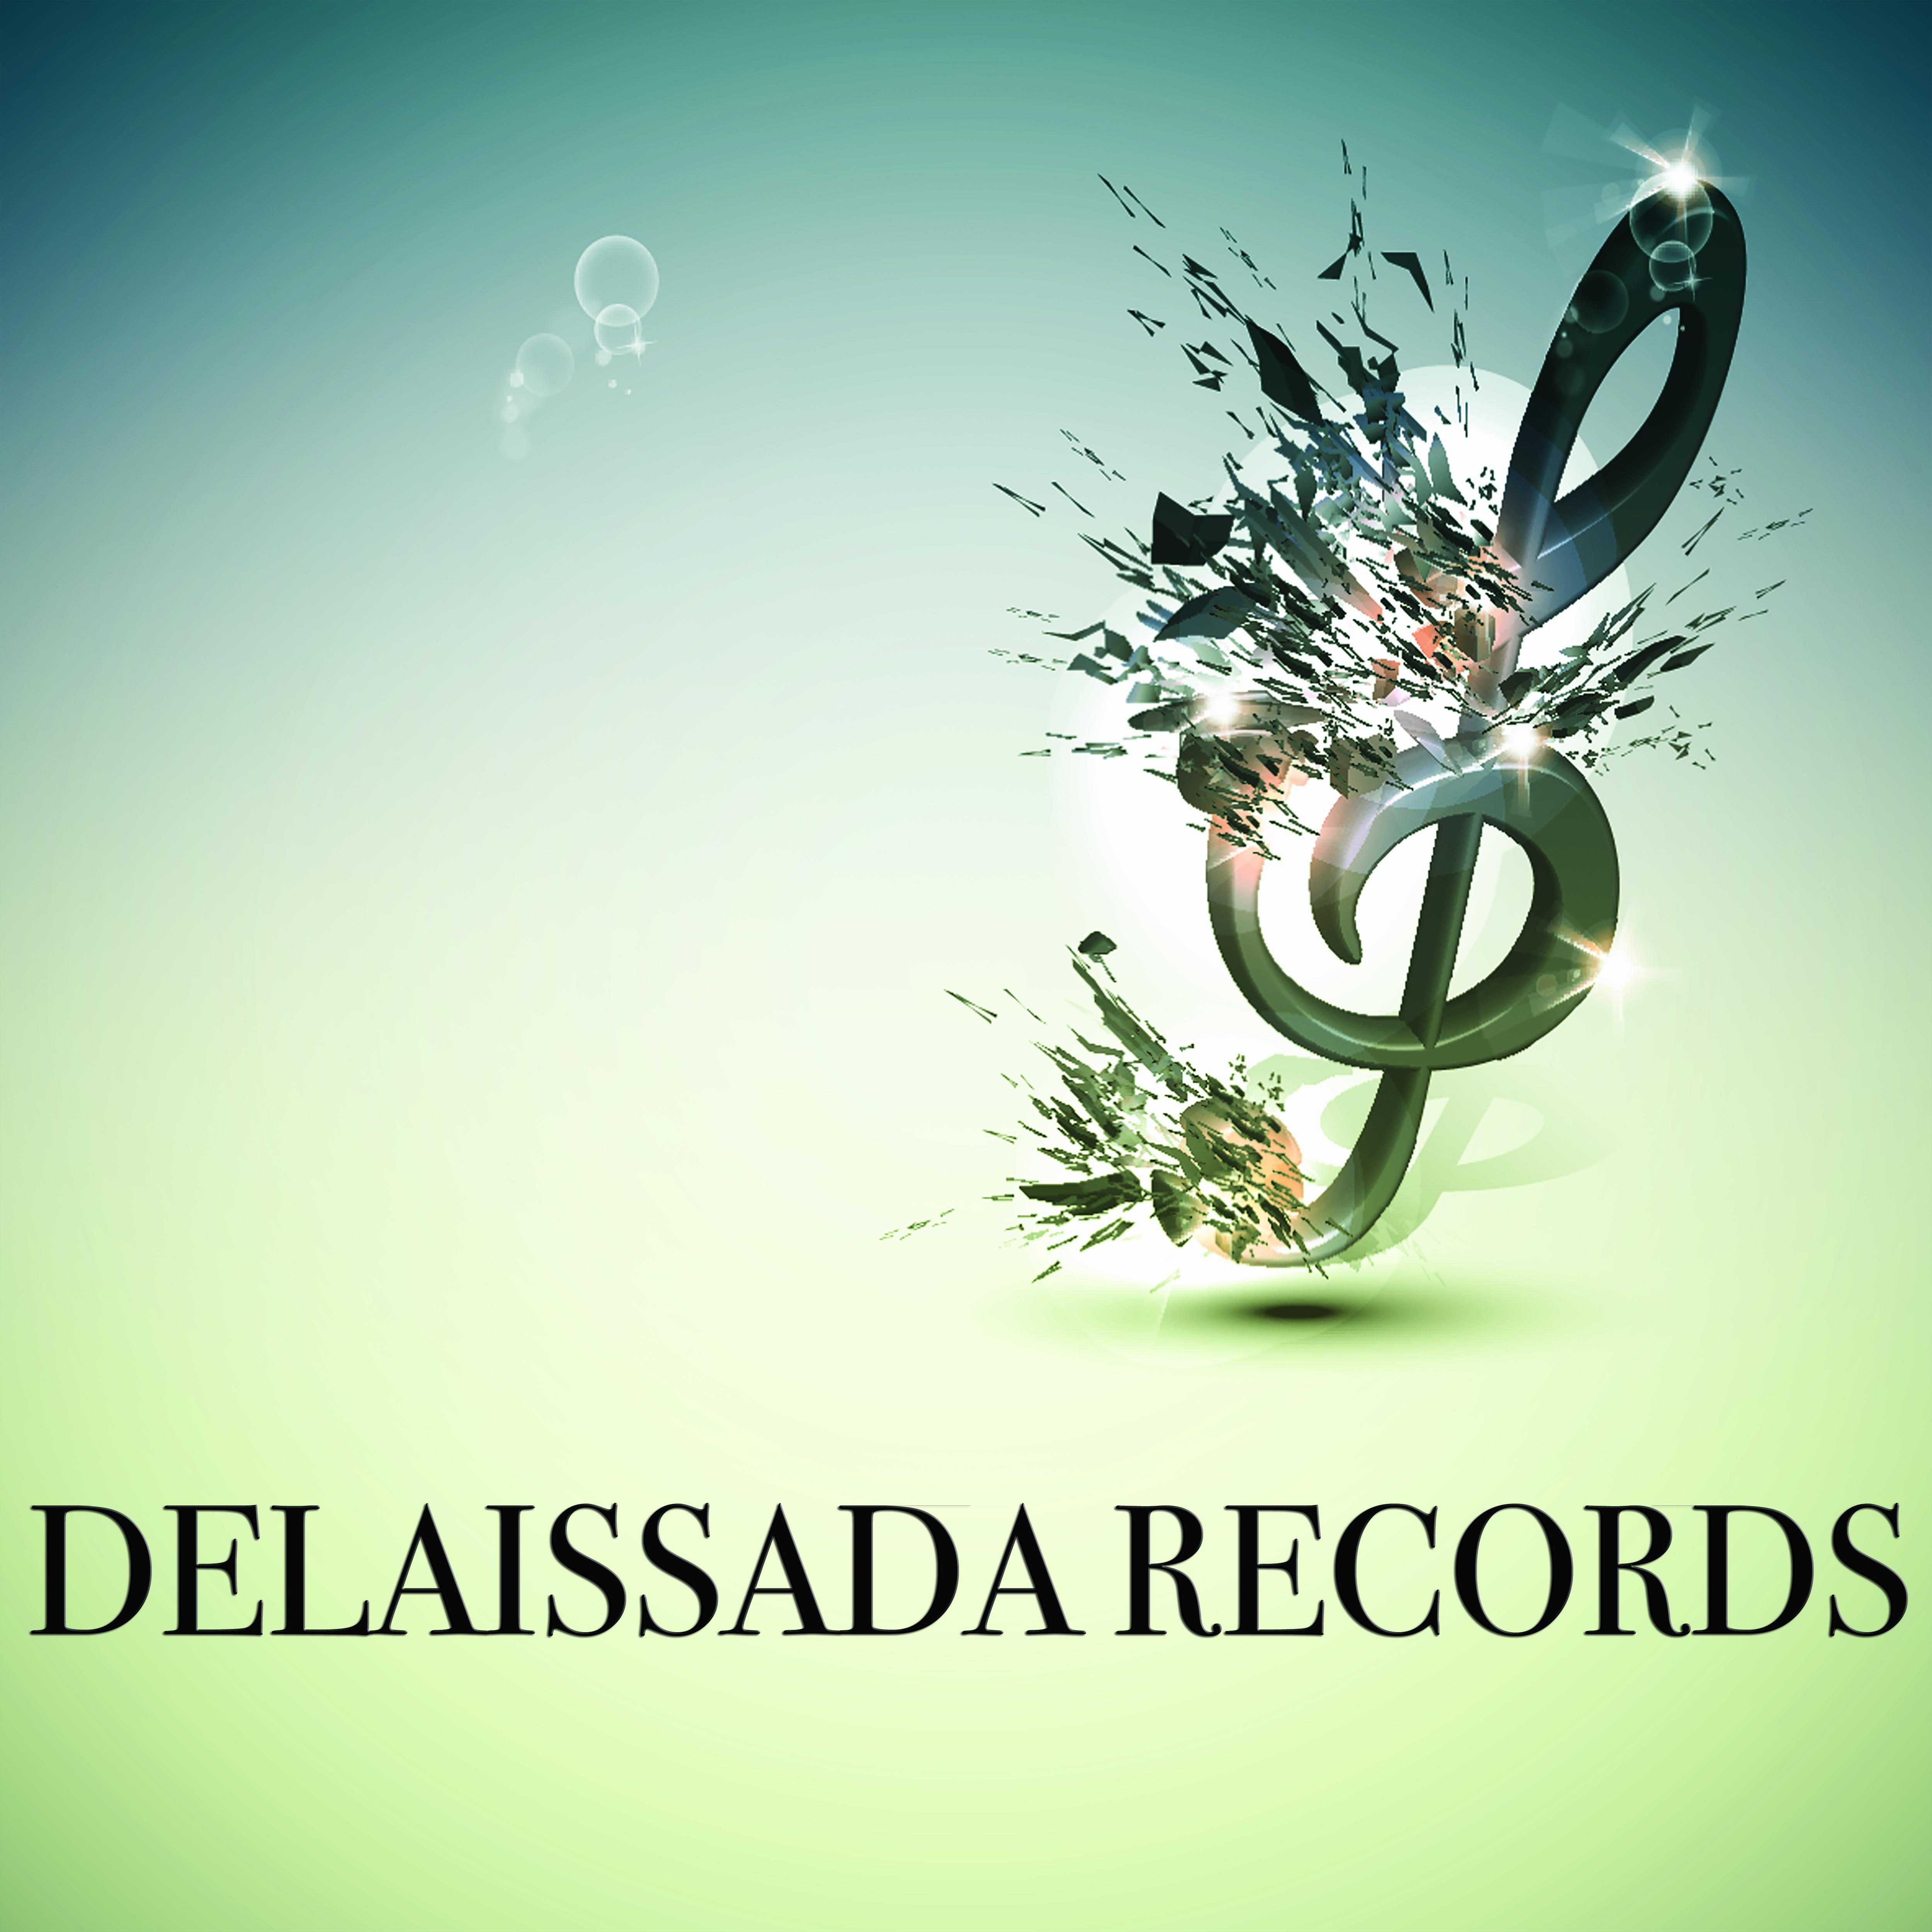 Delaissada Records